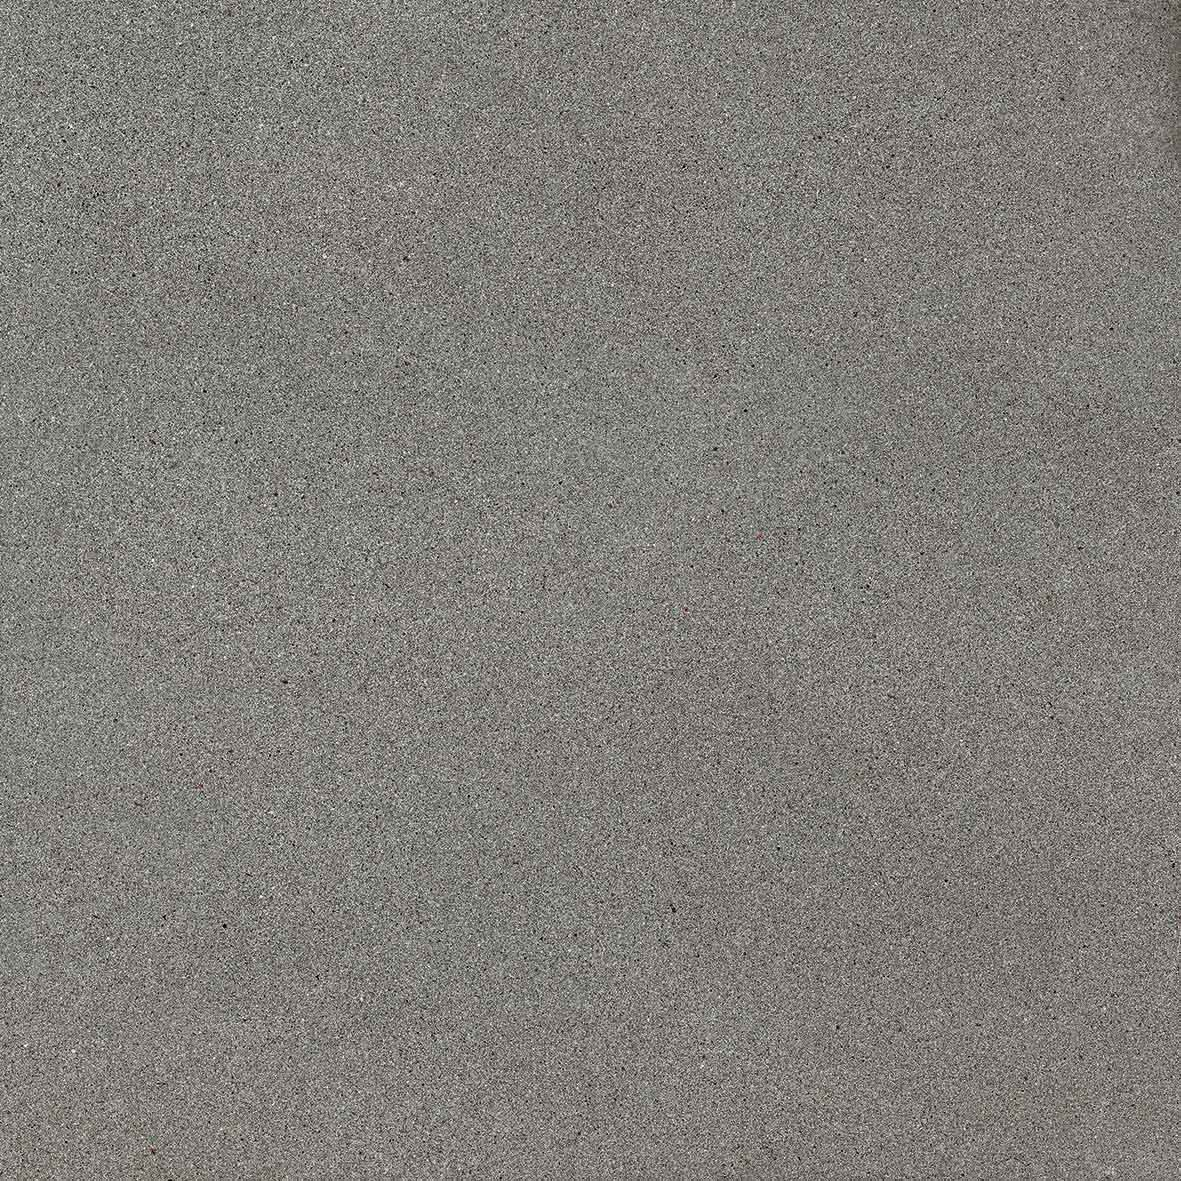 Airtech New York Light Grey Slate-hammered 10mm 60 x 60